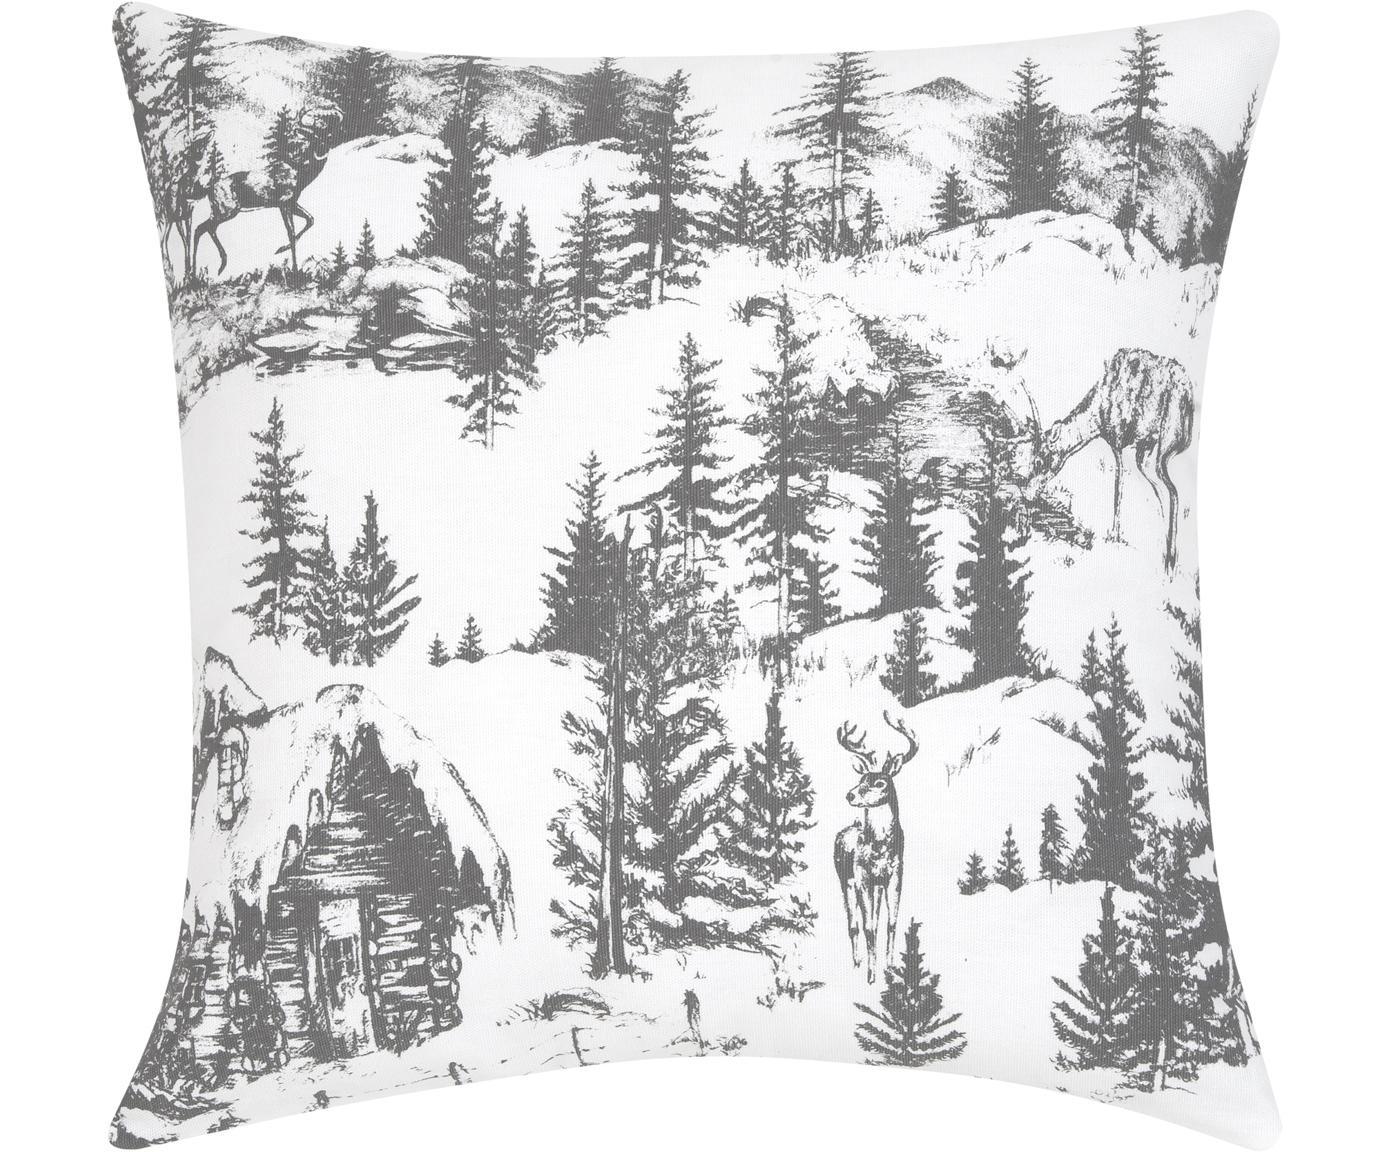 Funda de cojín Nordic, Algodón, Gris oscuro, blanco, An 40 x L 40 cm